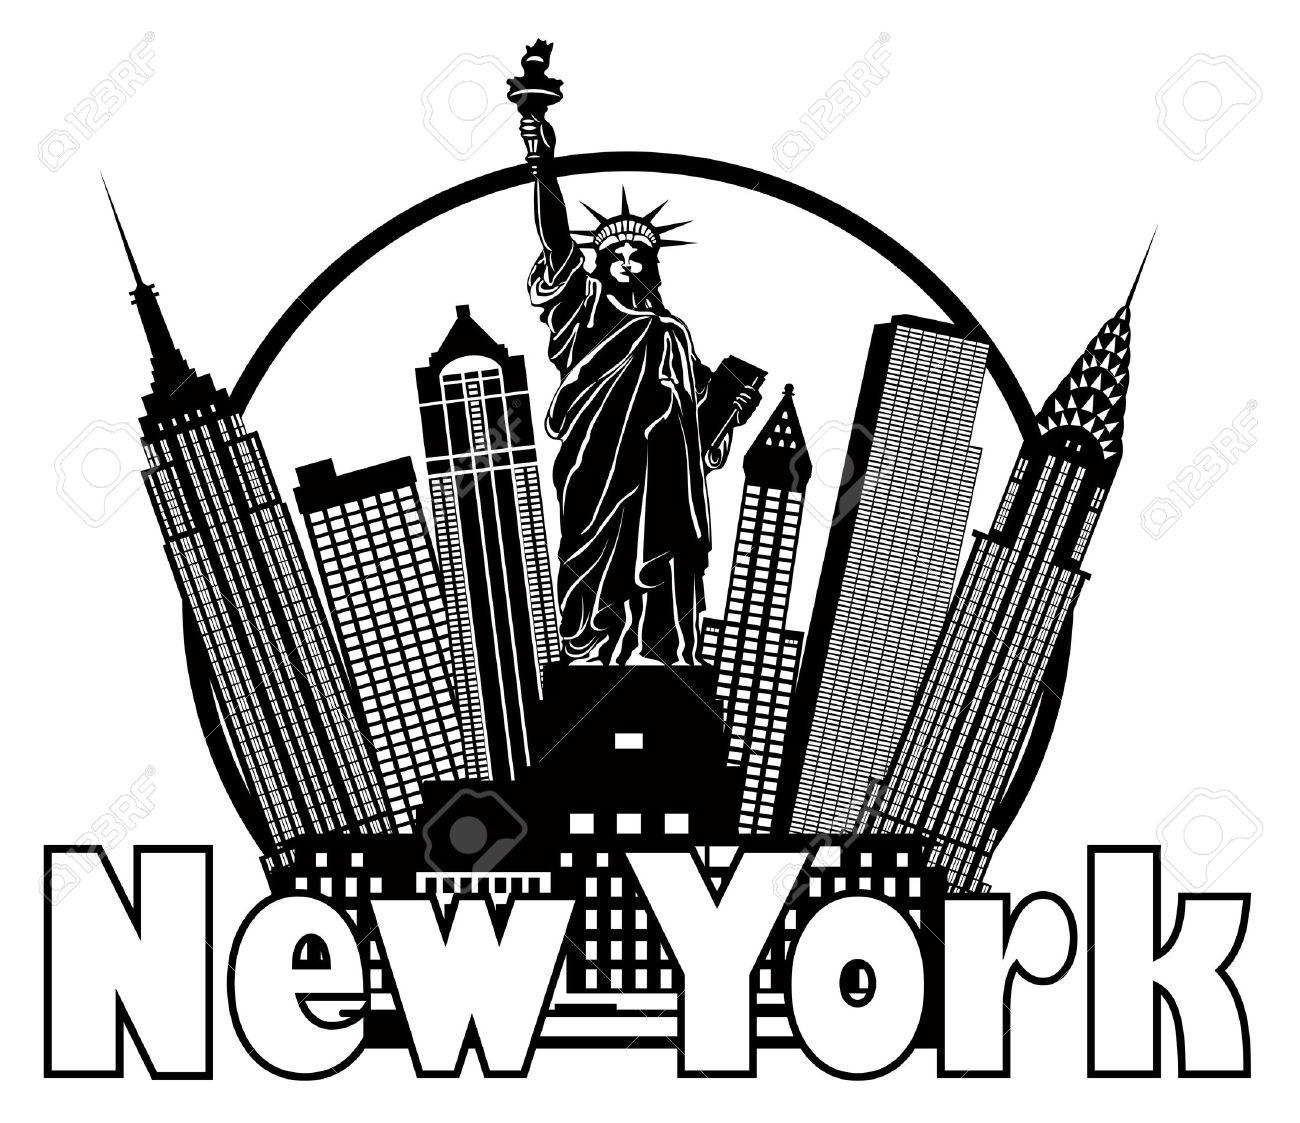 New York City Clipart - ClipartFest-New york city clipart - ClipartFest-5